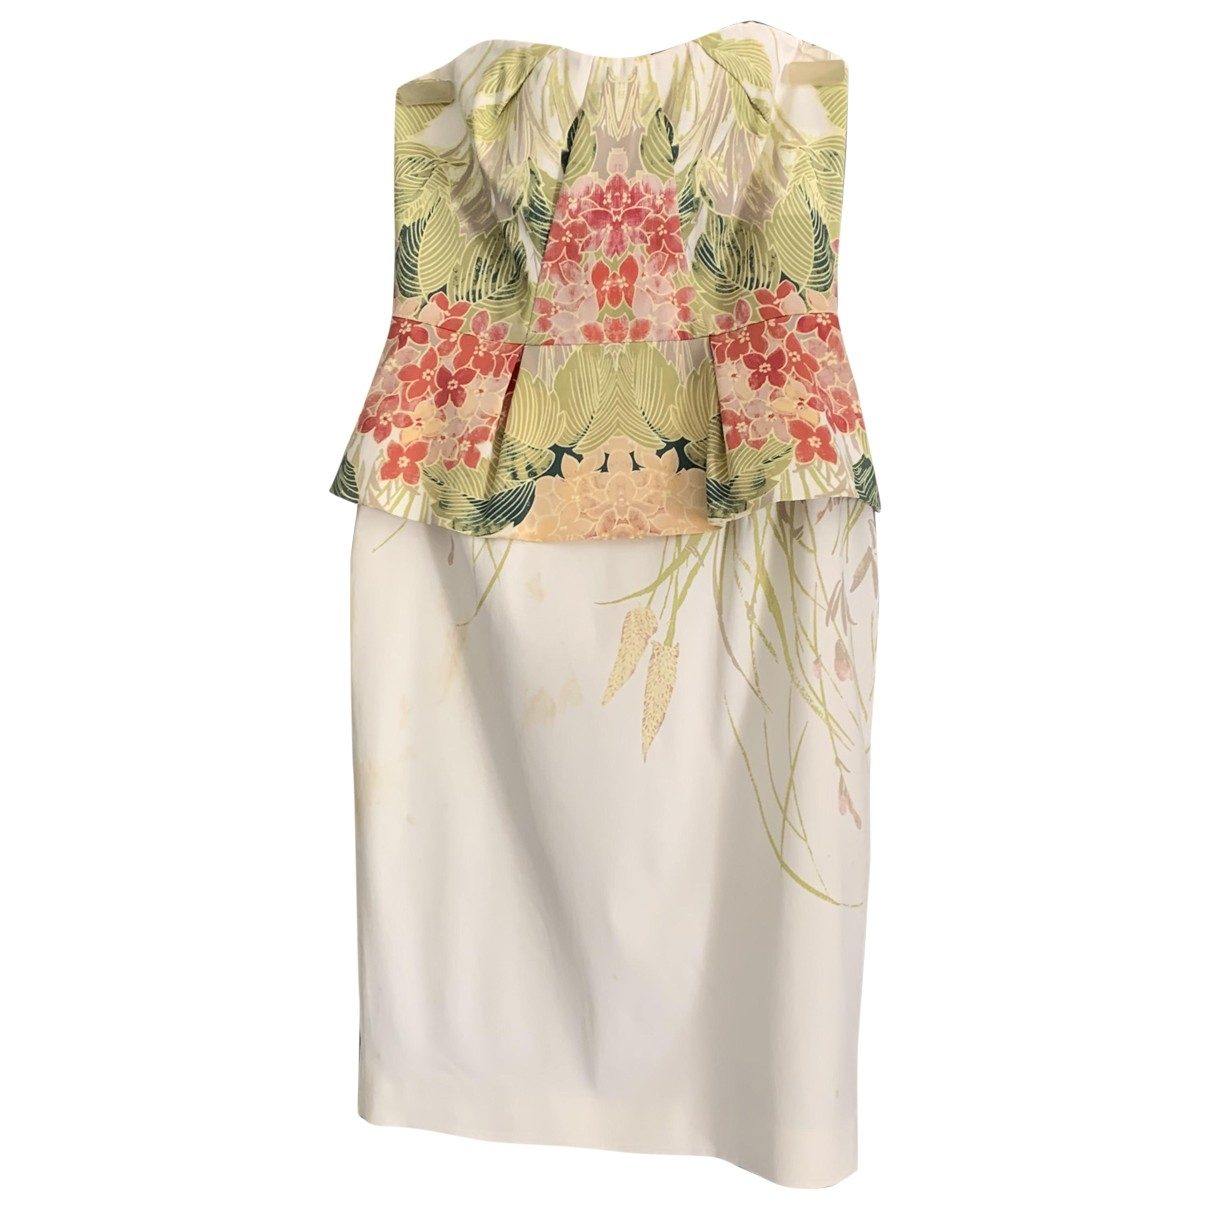 Karen Millen \N Beige dress for Women 42 FR